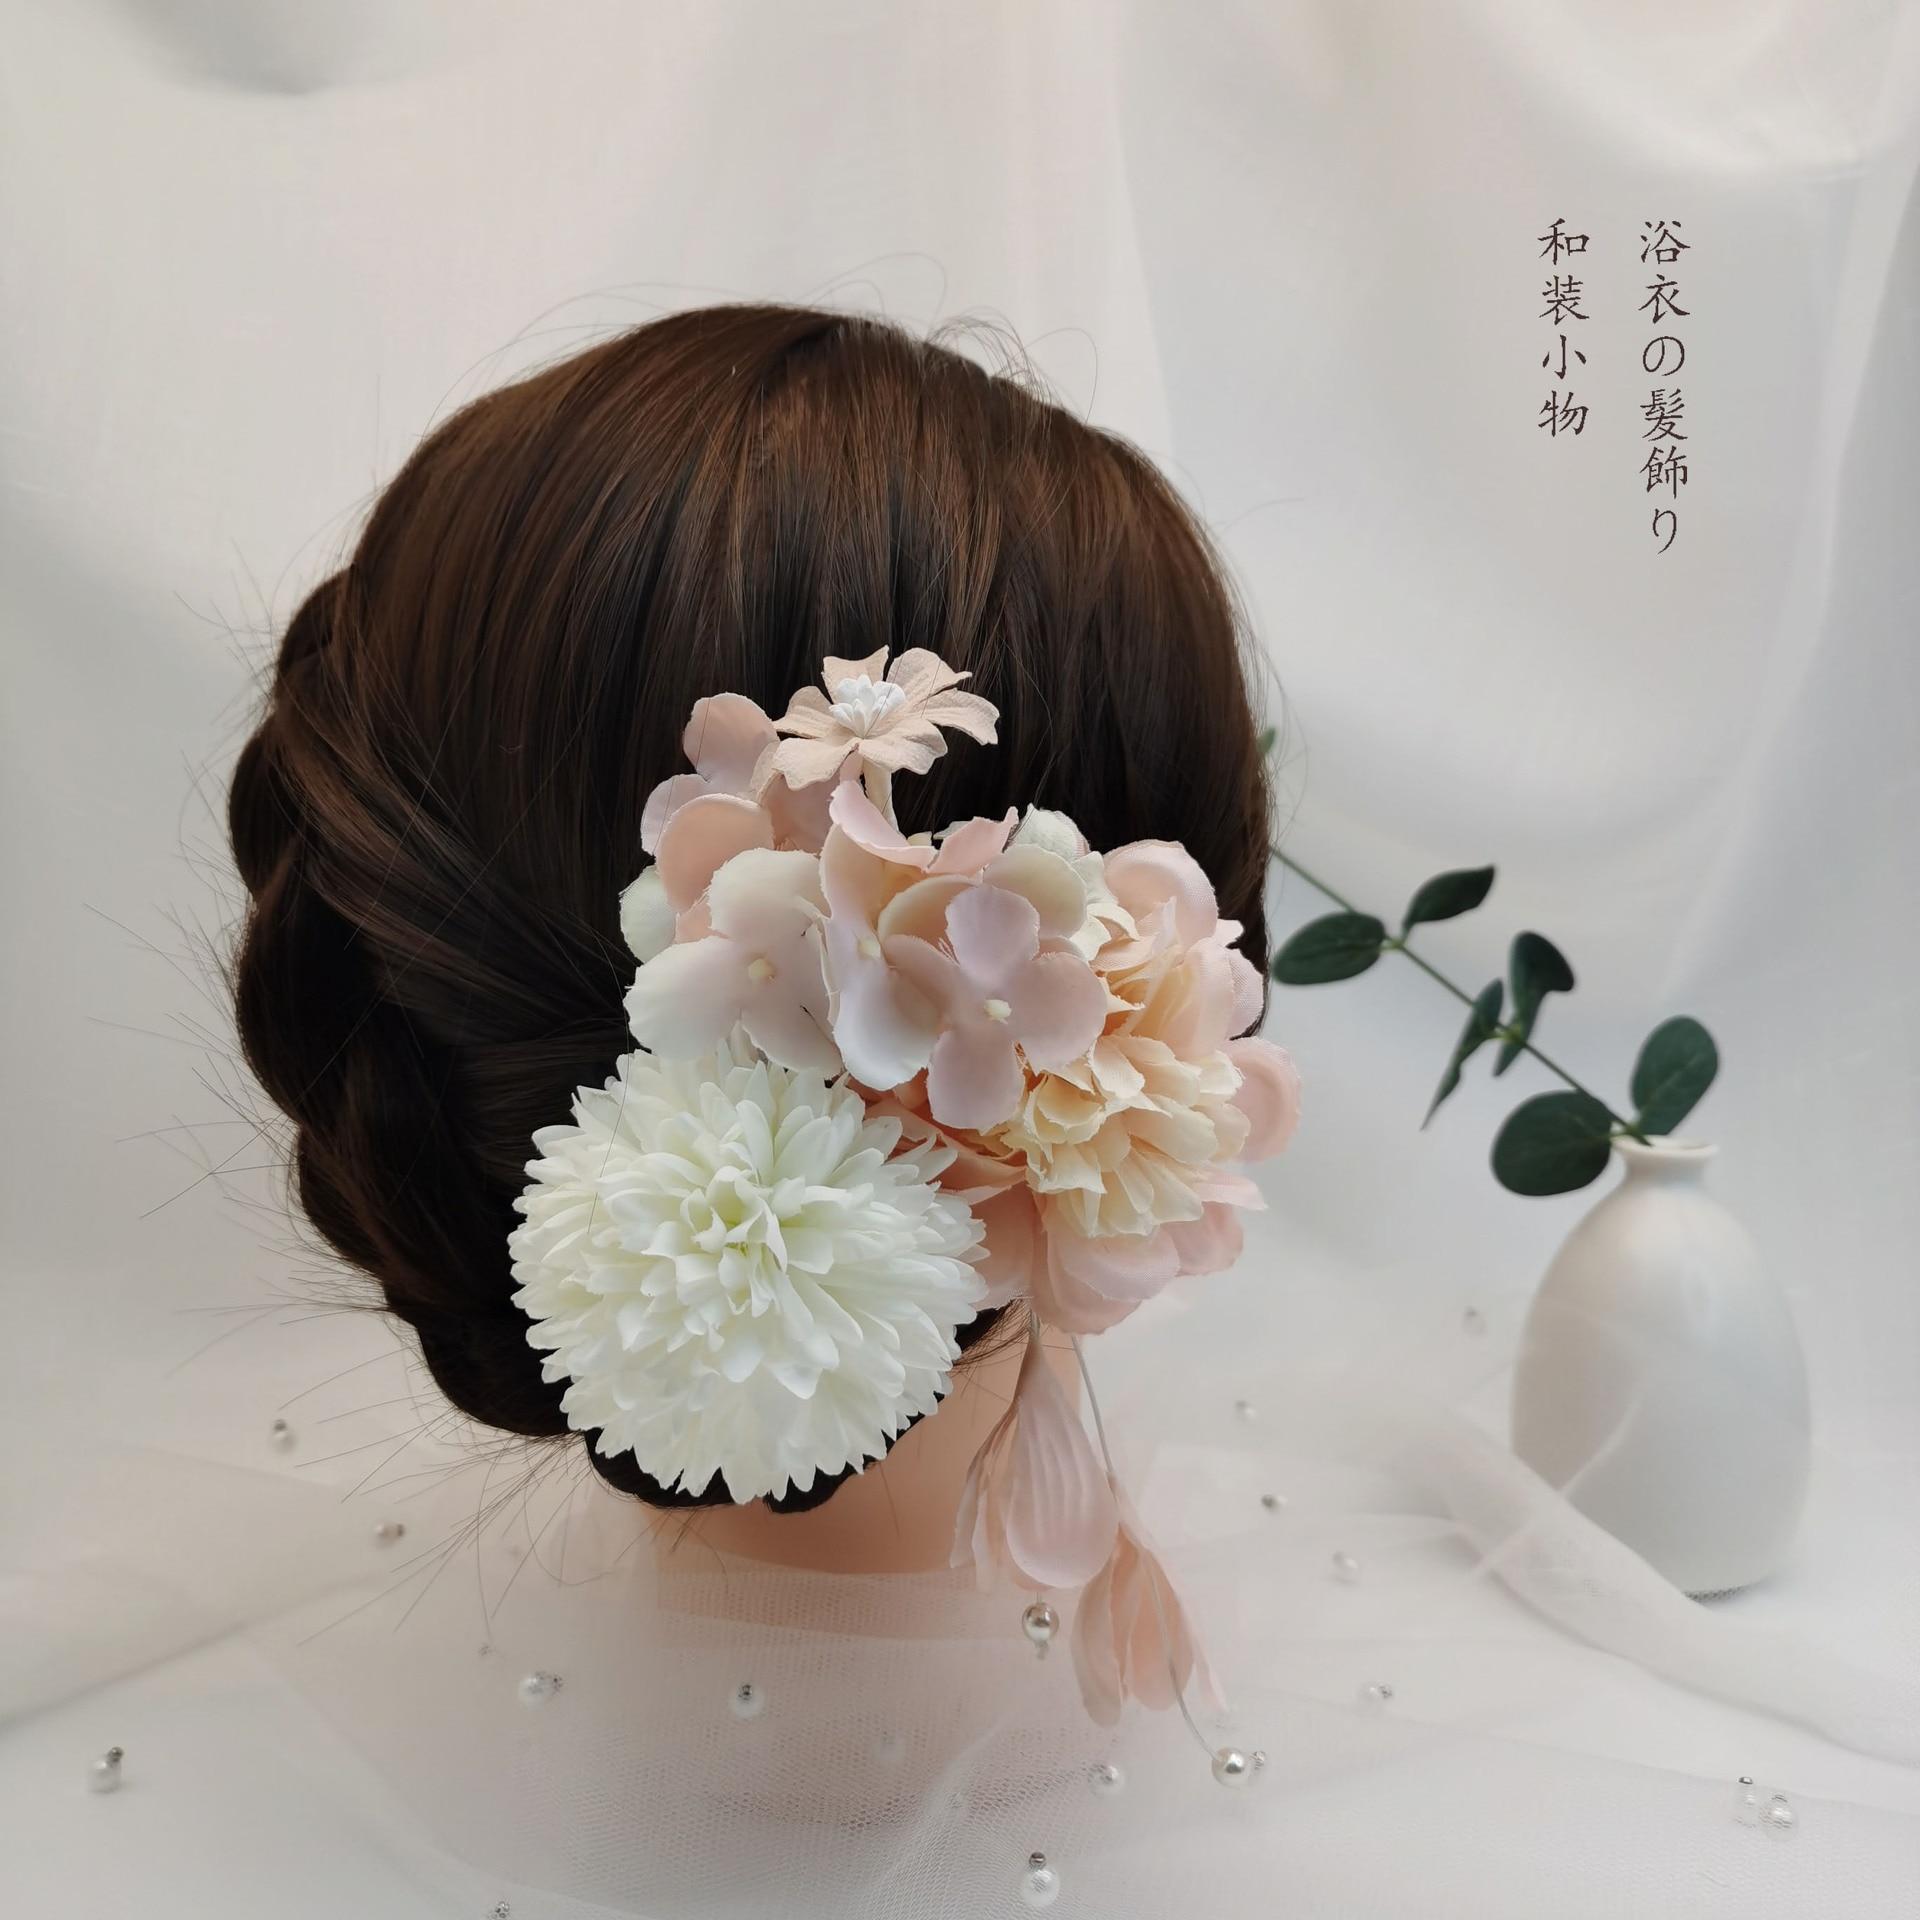 Princess Beautiful Elegant Flower Barrettes Hydrangea Pearl Droop Antique Hair Clasp  hair weeding accessoire